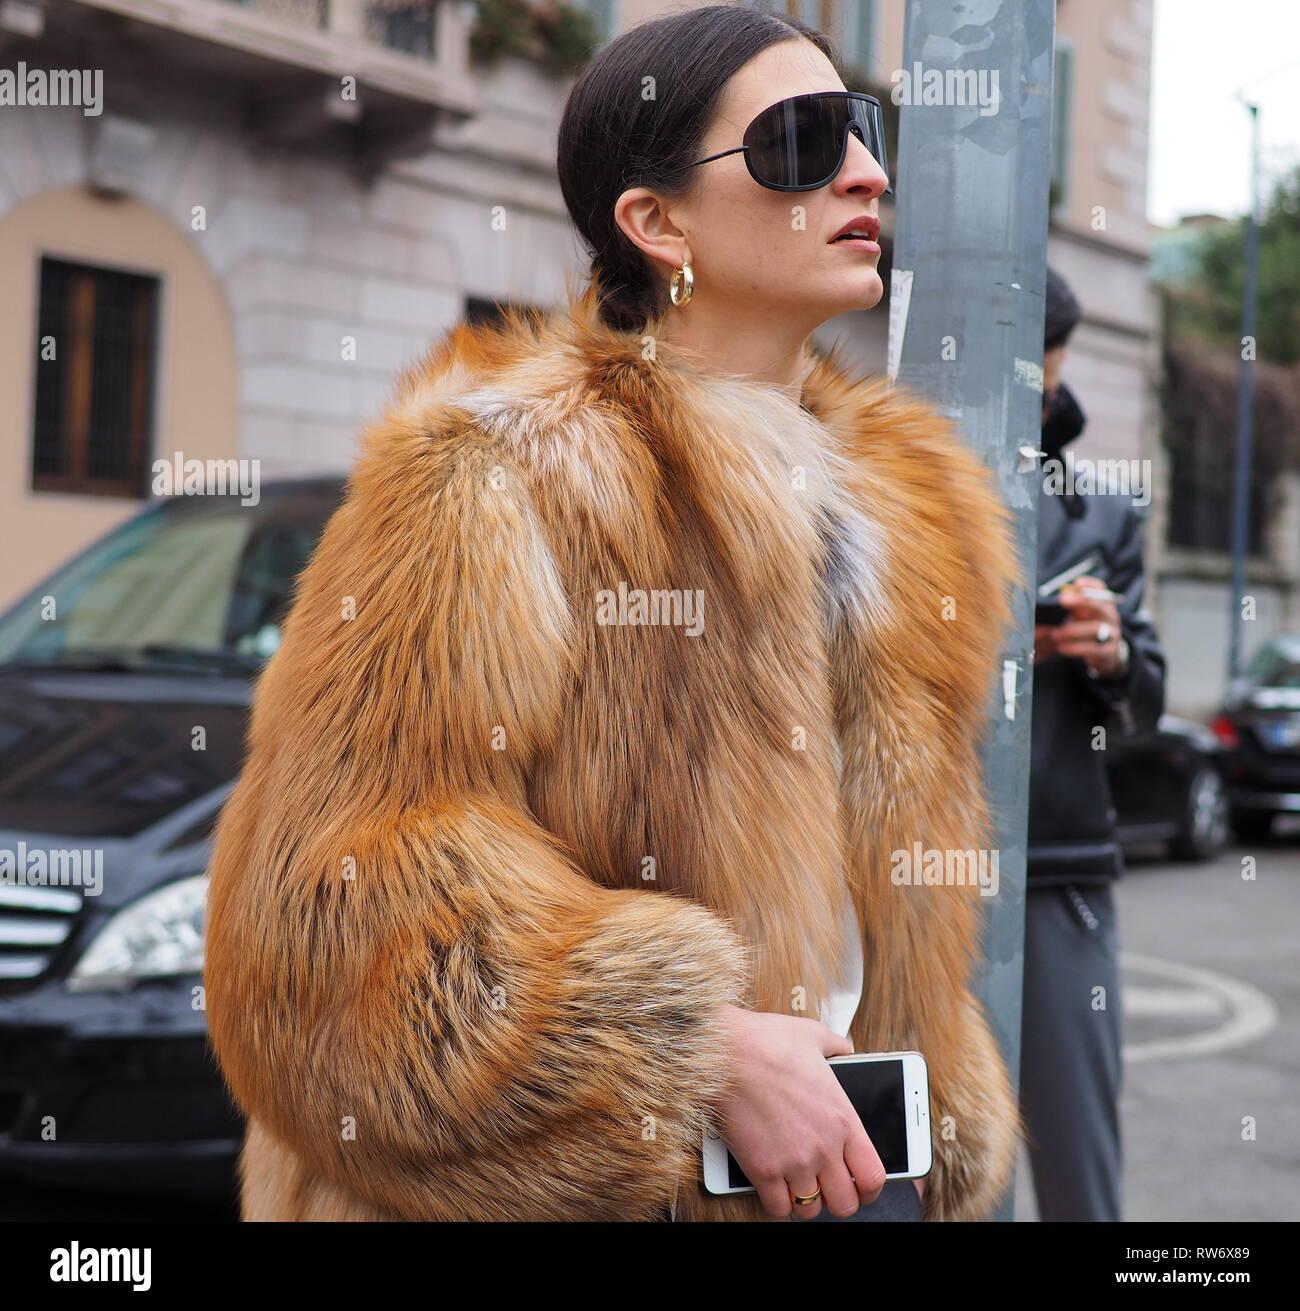 MILAN, Italy: 23 February 2019: Fashion blogger street style outfit before Roberto Cavalli fashion show during Milan fashion - OL7 - Stock Image